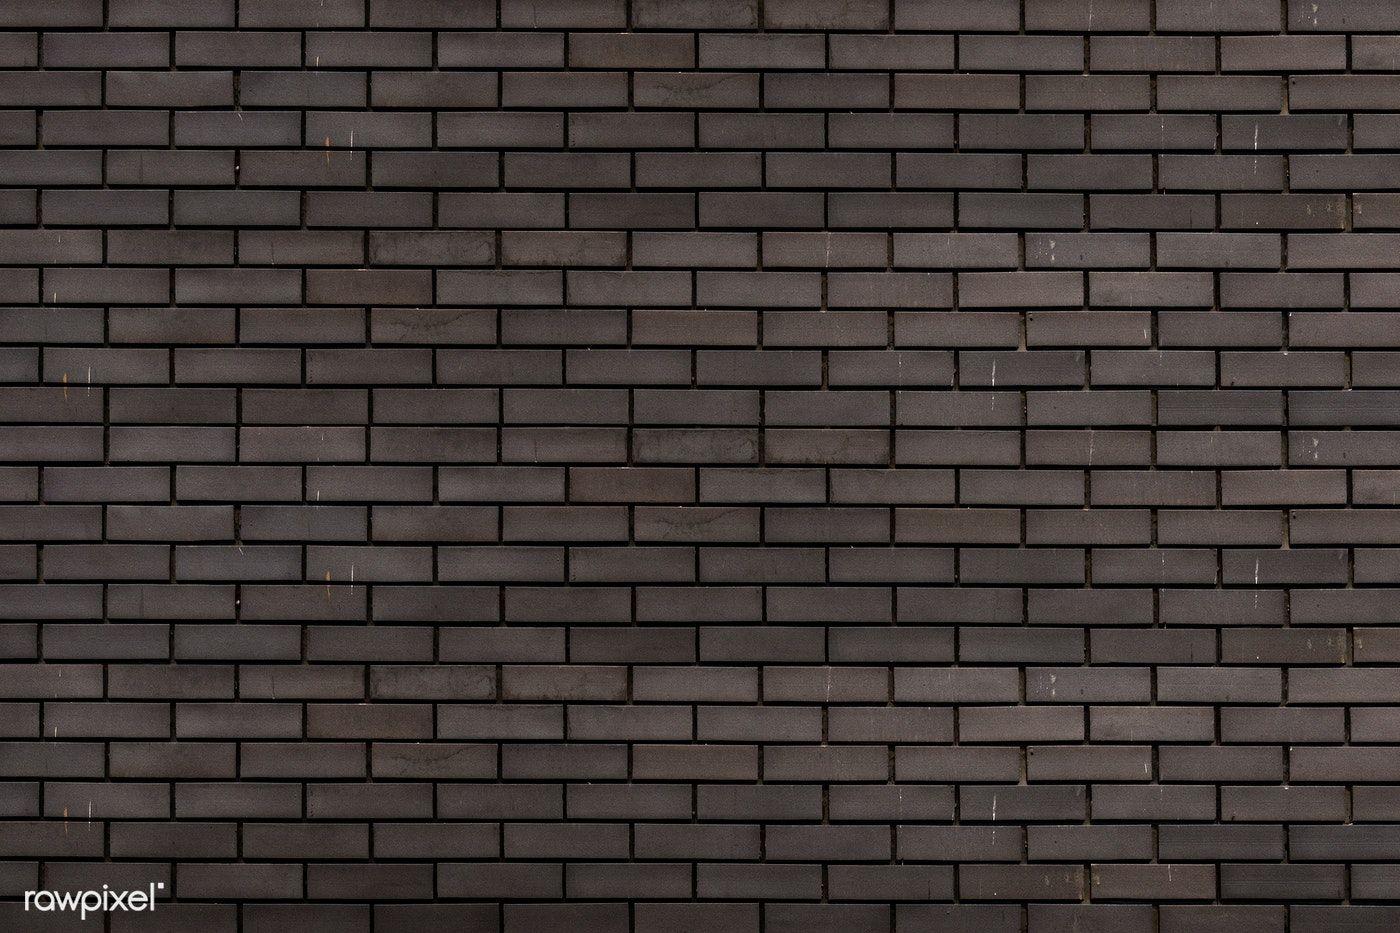 Gray Brick Wall Textured Background Free Image By Rawpixel Com Brick Wall Background Grey Brick Brick Wall